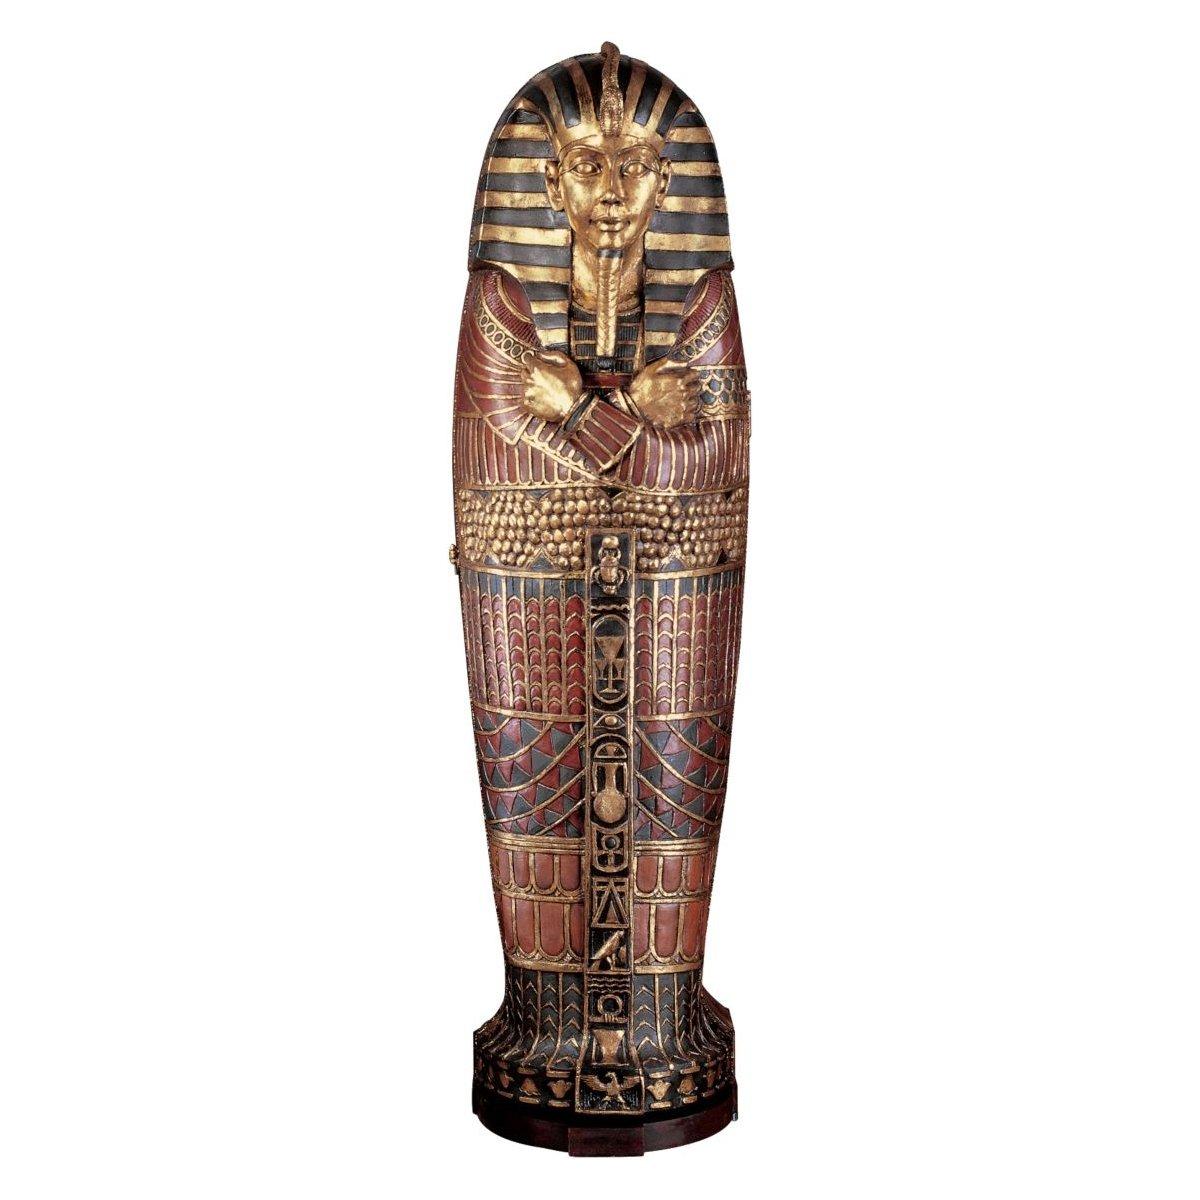 75'' Classic Egyptian Statue Sculpture King Tut Tutankhamen Life-size Sarcopha...